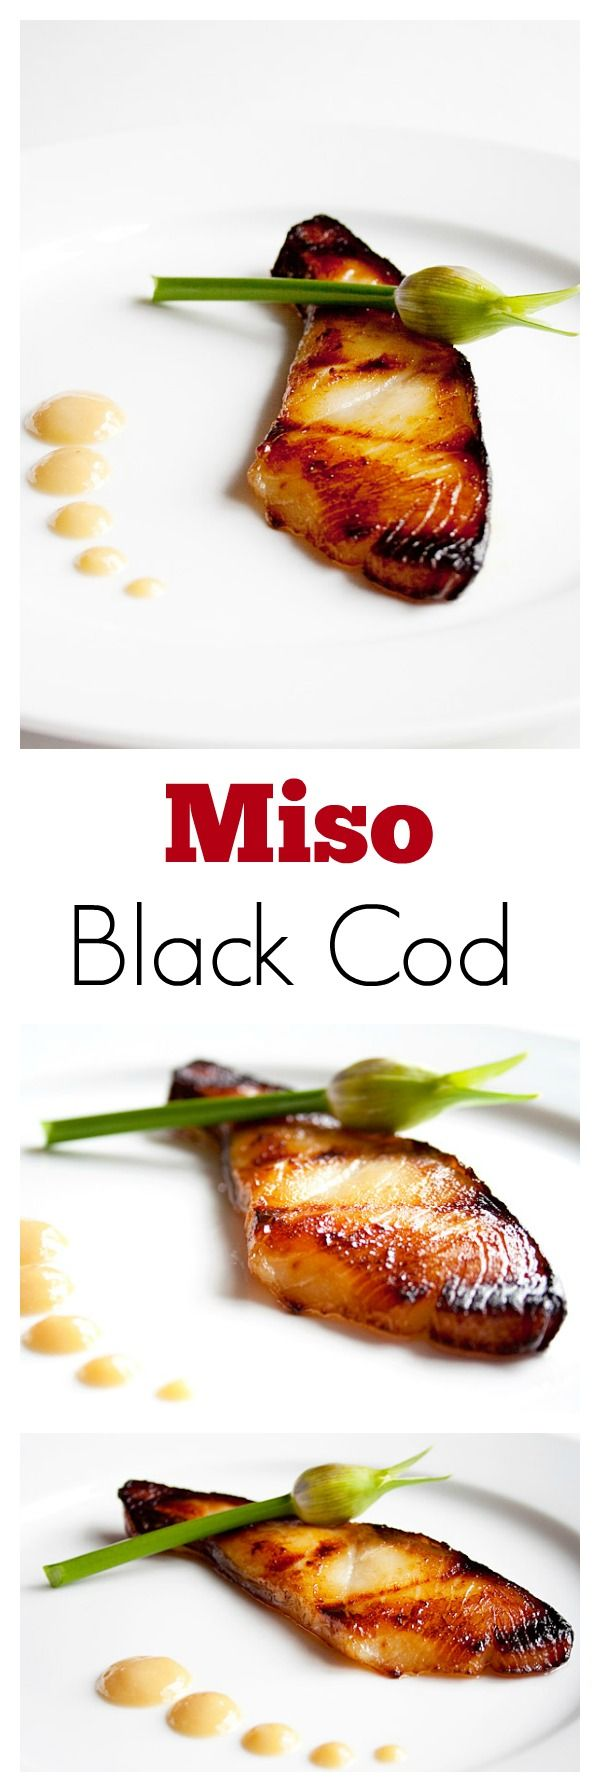 Mother's Day idea - Nobu Matsuhisa's Miso Cod – delicious, moist, and tender cod fish marinated with Japanese miso. | rasamalaysia.com